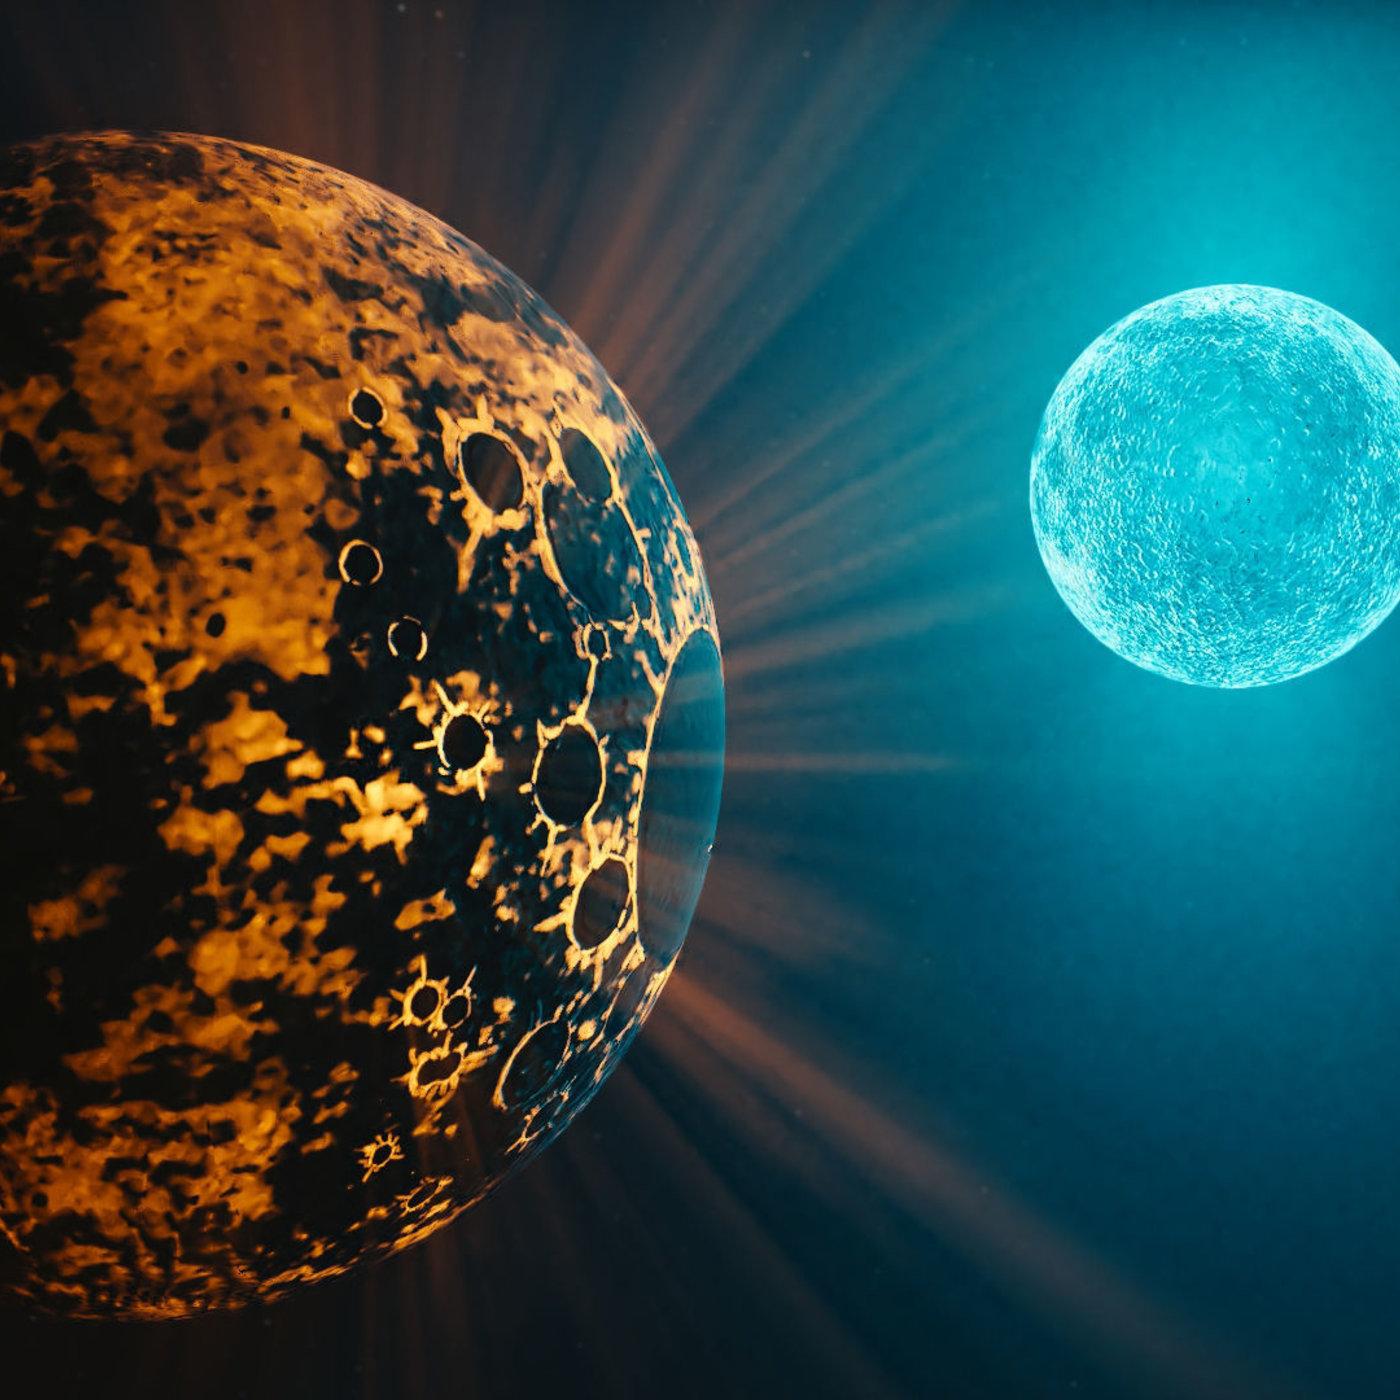 Fantasy Planets